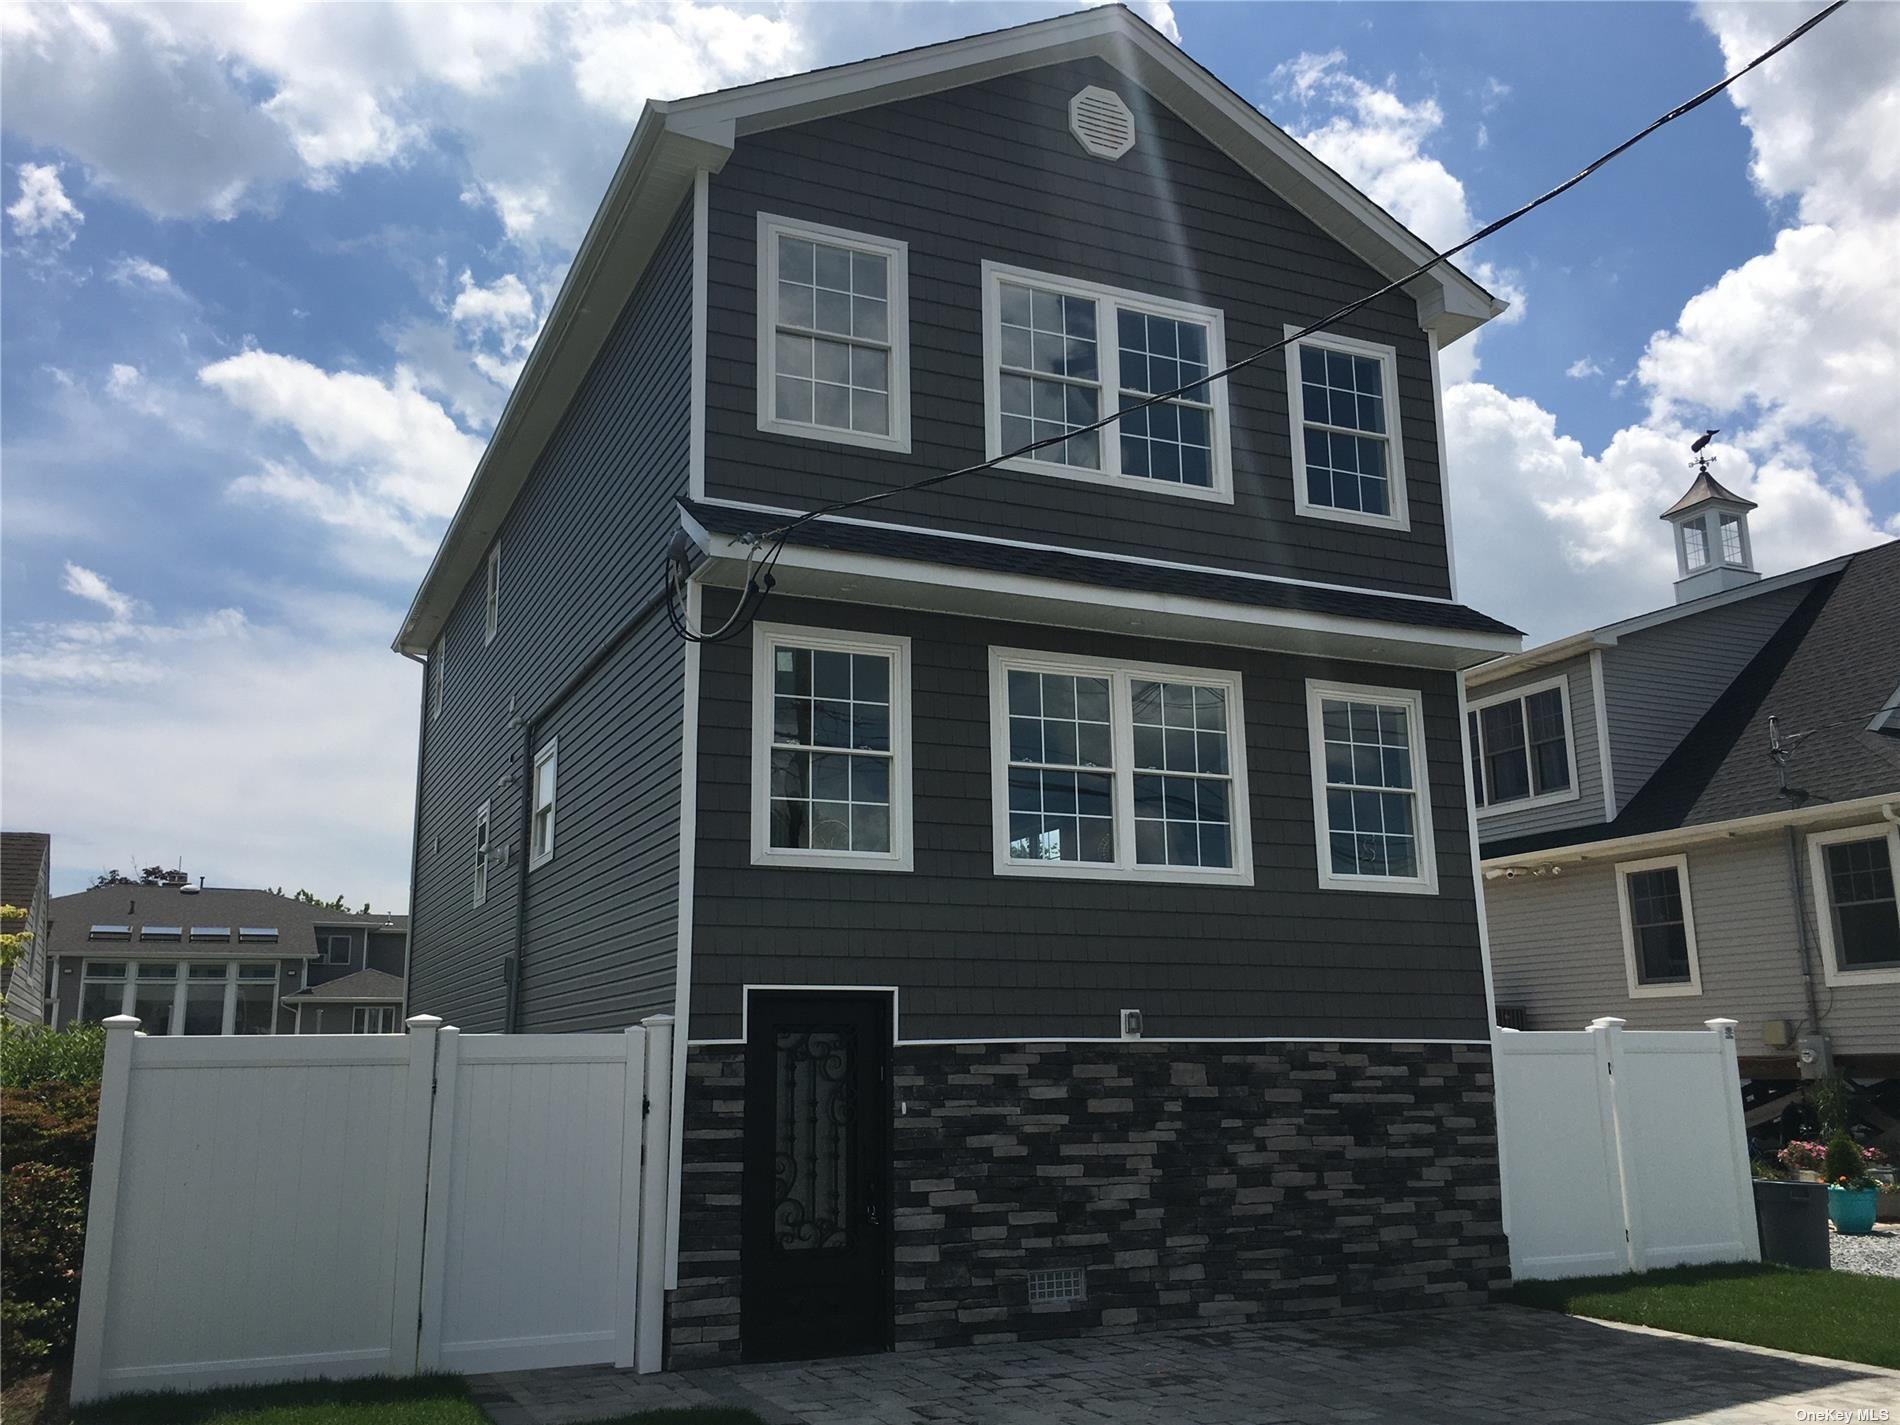 12 Garfield Place, Massapequa, NY 11758 - MLS#: 3320132